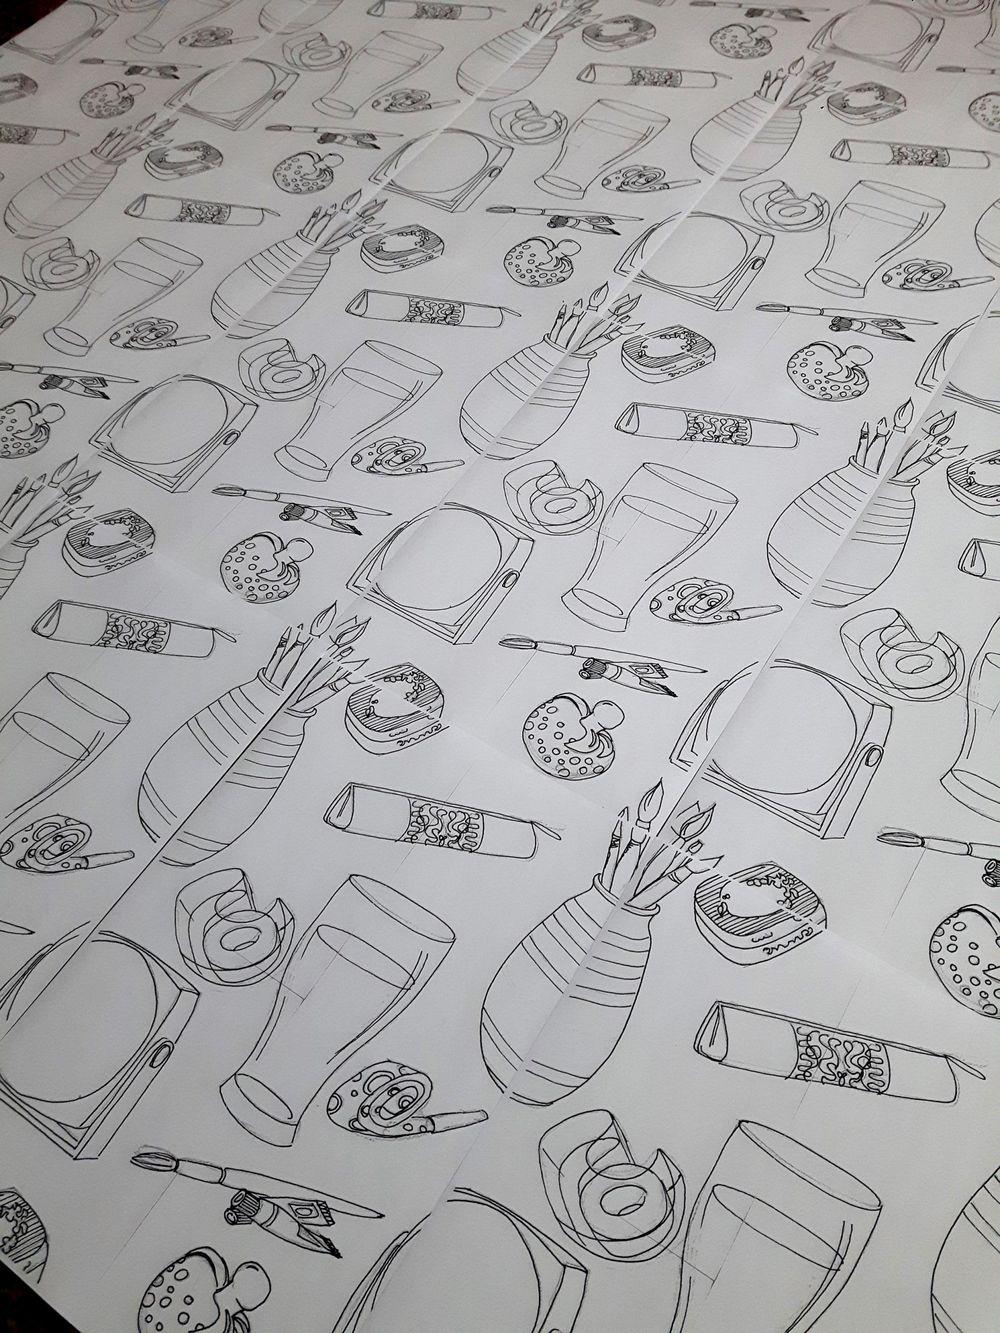 Handmade pattern - image 1 - student project